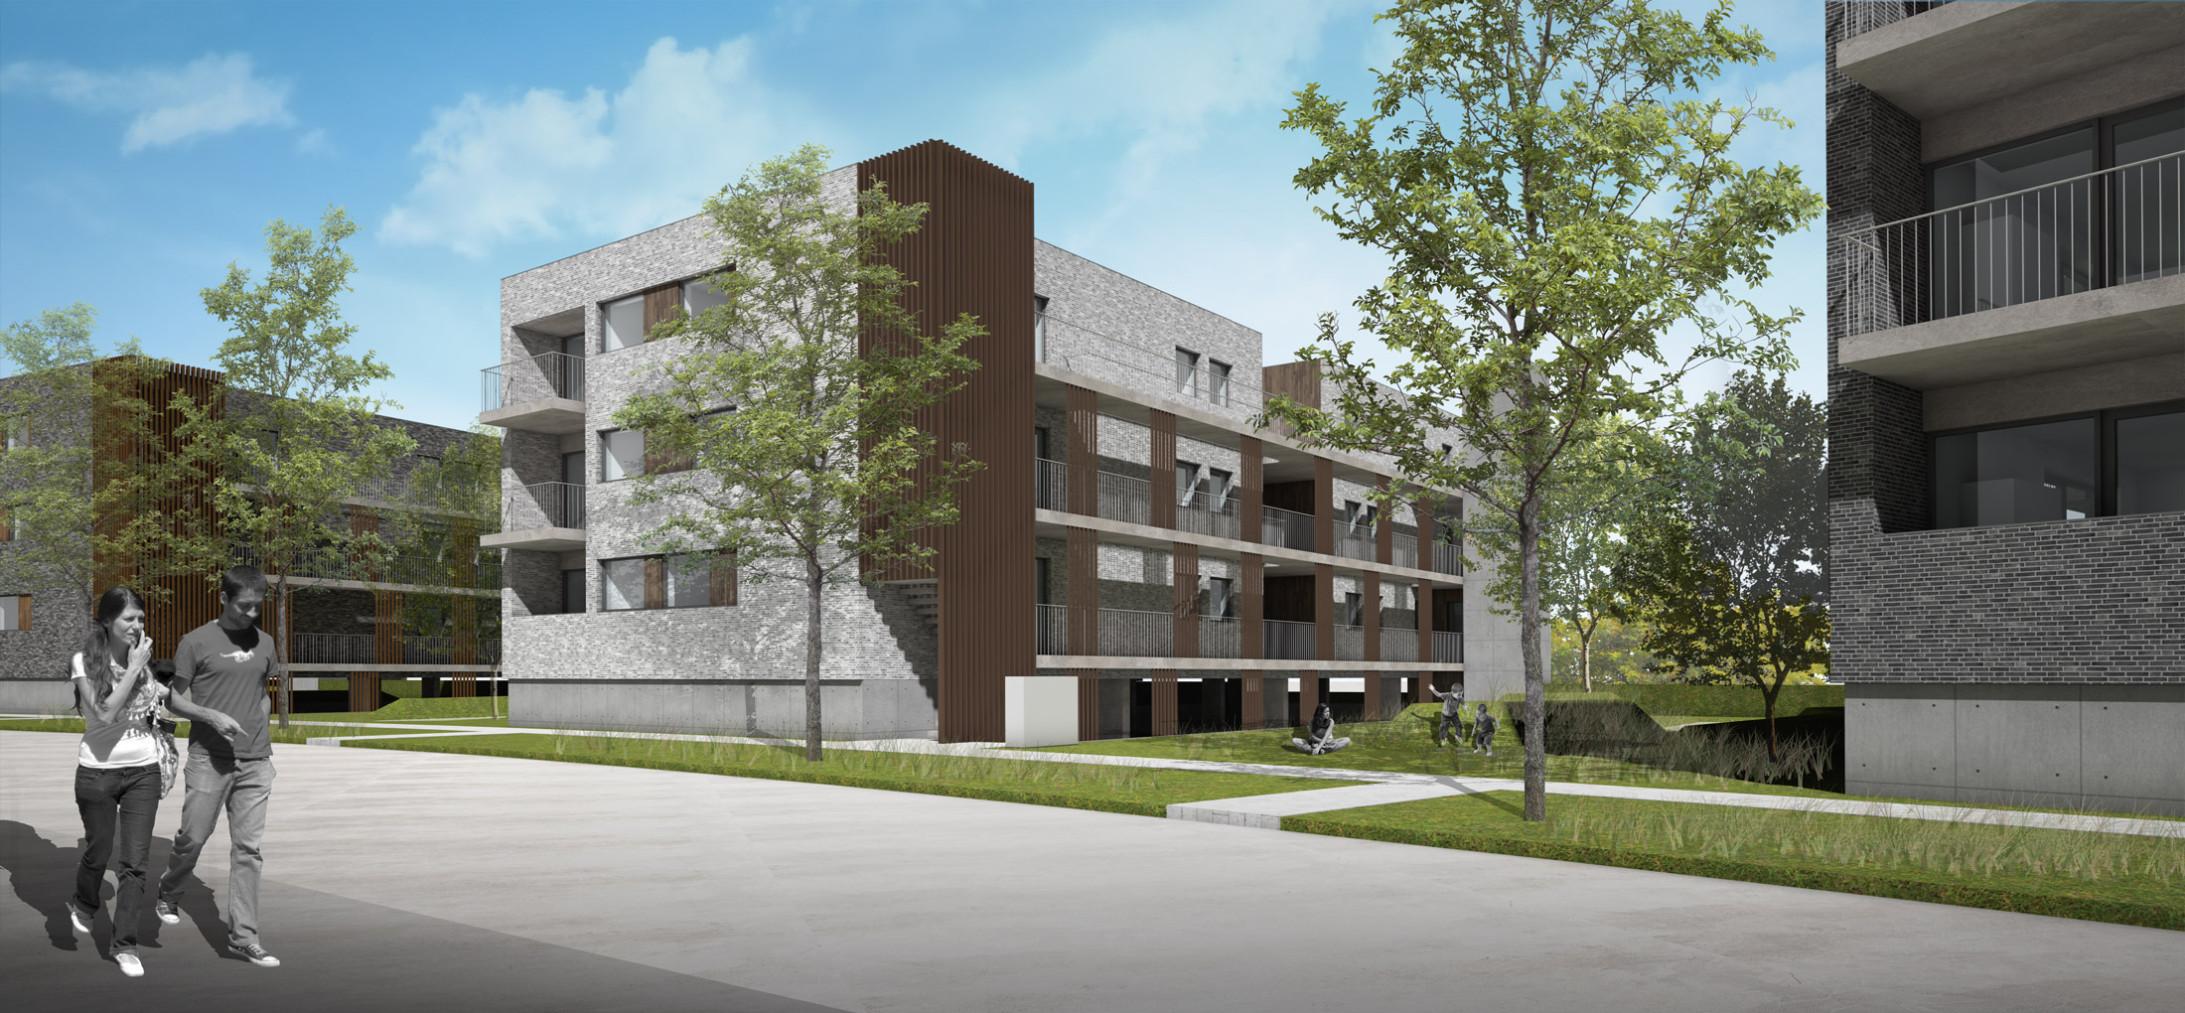 Sociale huisvesting4-Desselgem Vlaslaan-Claeys Architecten.jpg